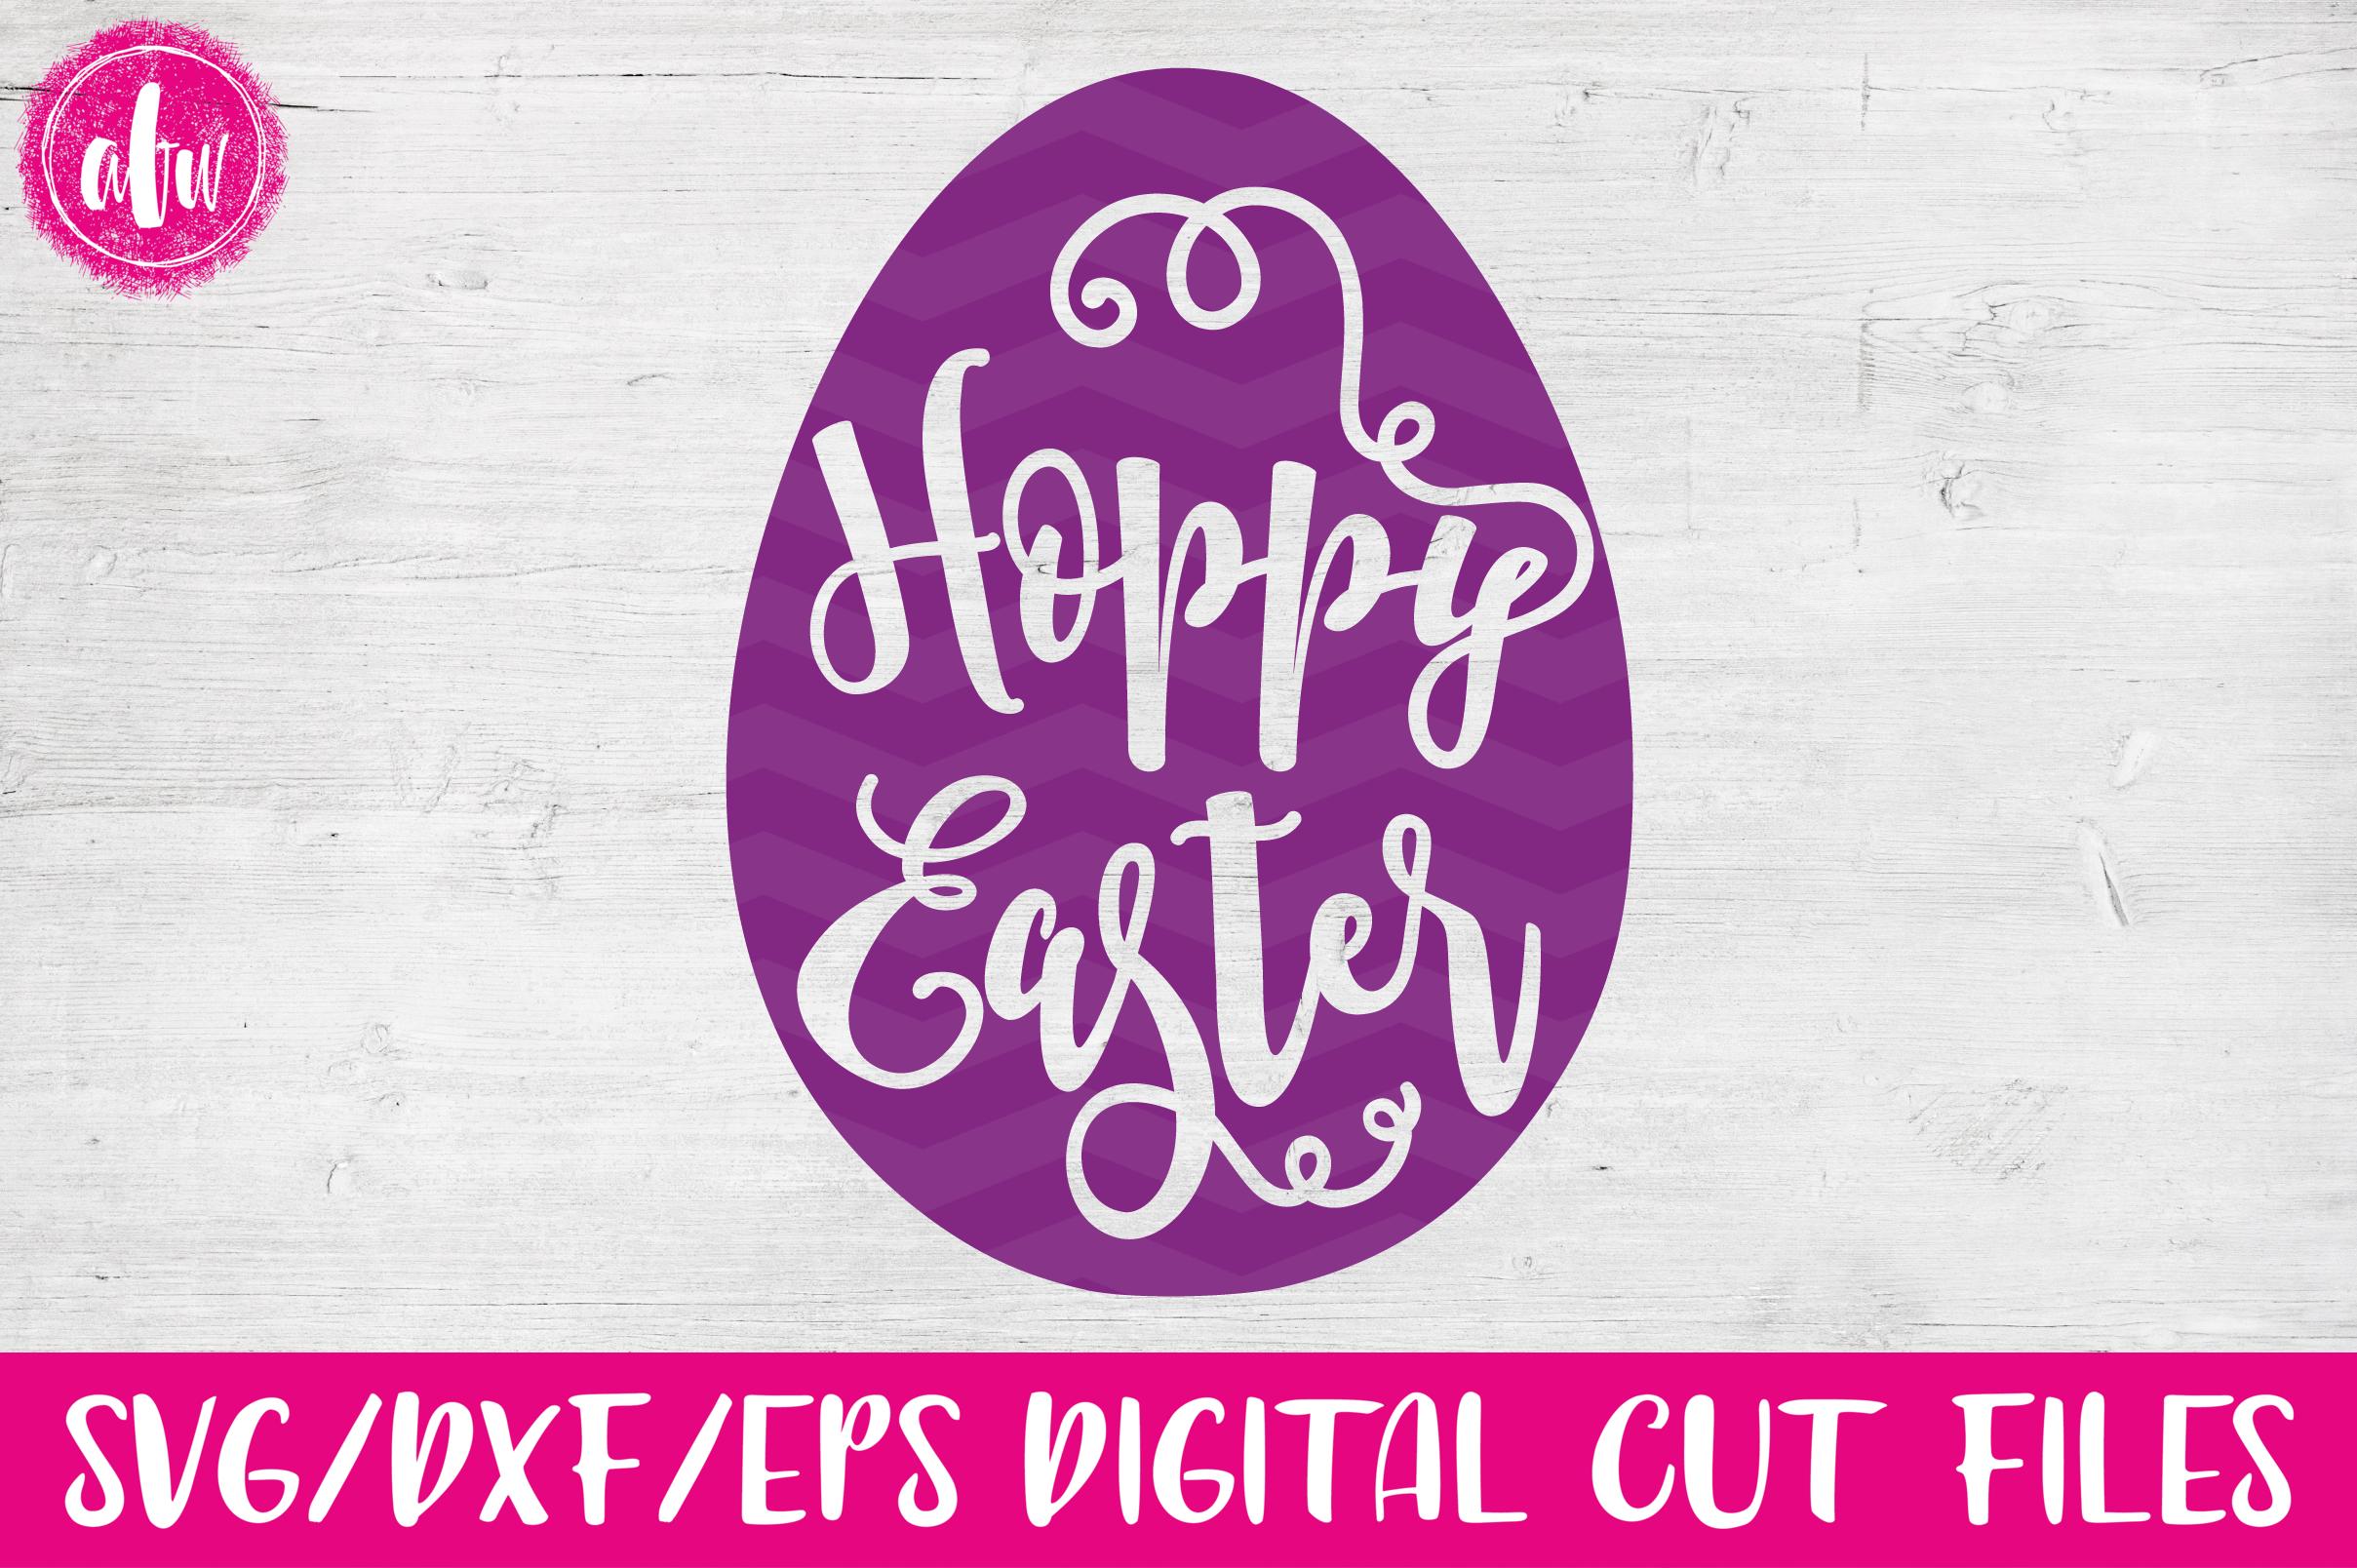 Hoppy Easter Egg - SVG, DXF, EPS Cut File example image 1